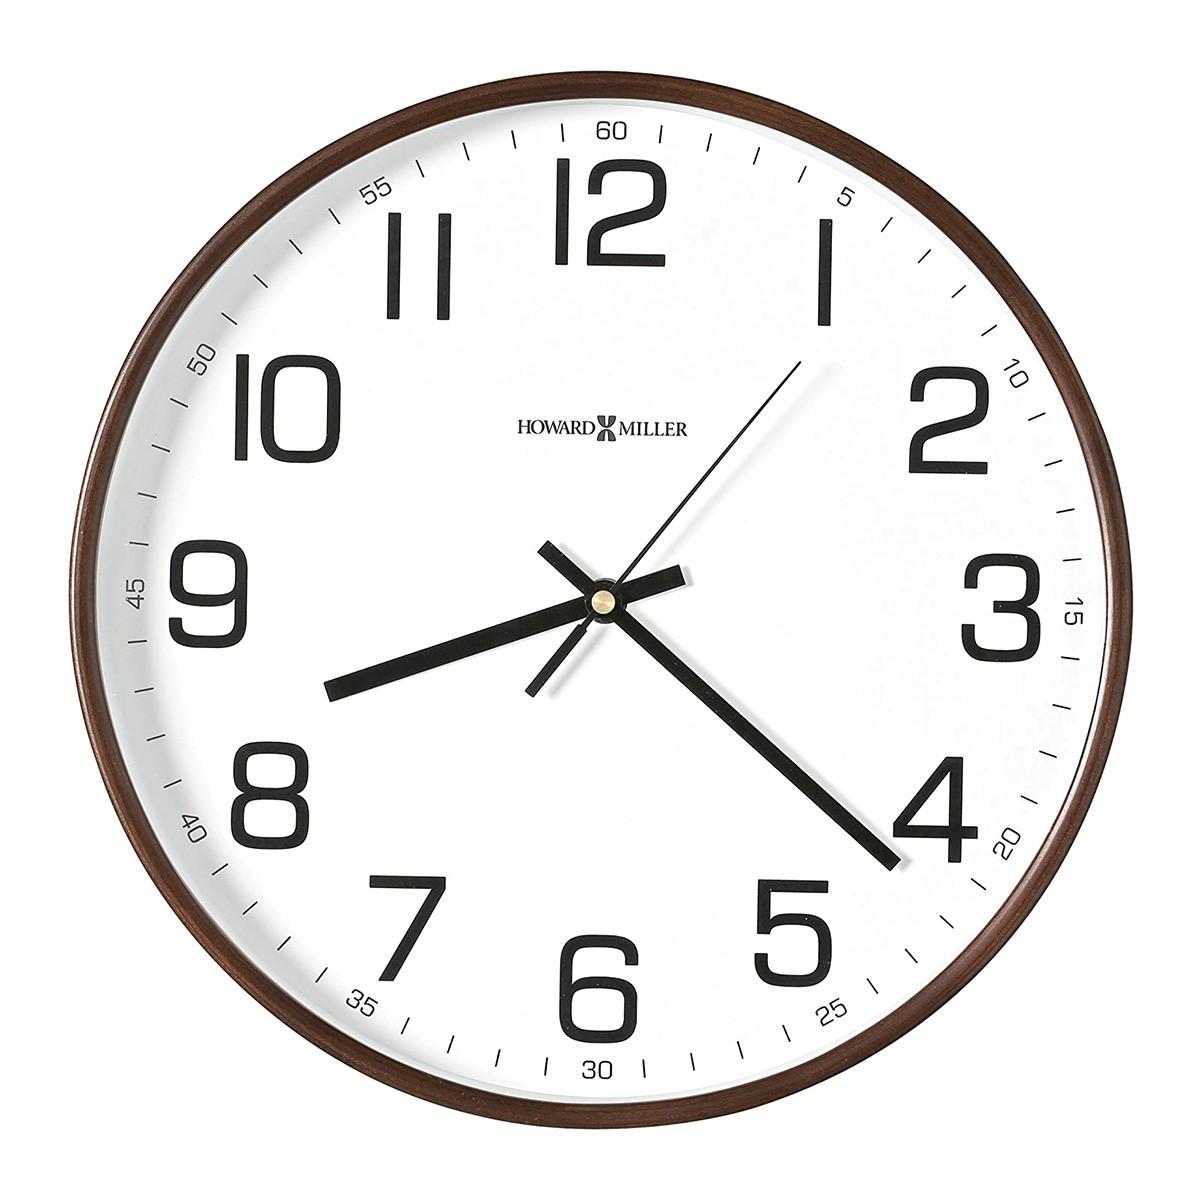 Howard Miller Kenton Timber Round Wall Clock, 32cm